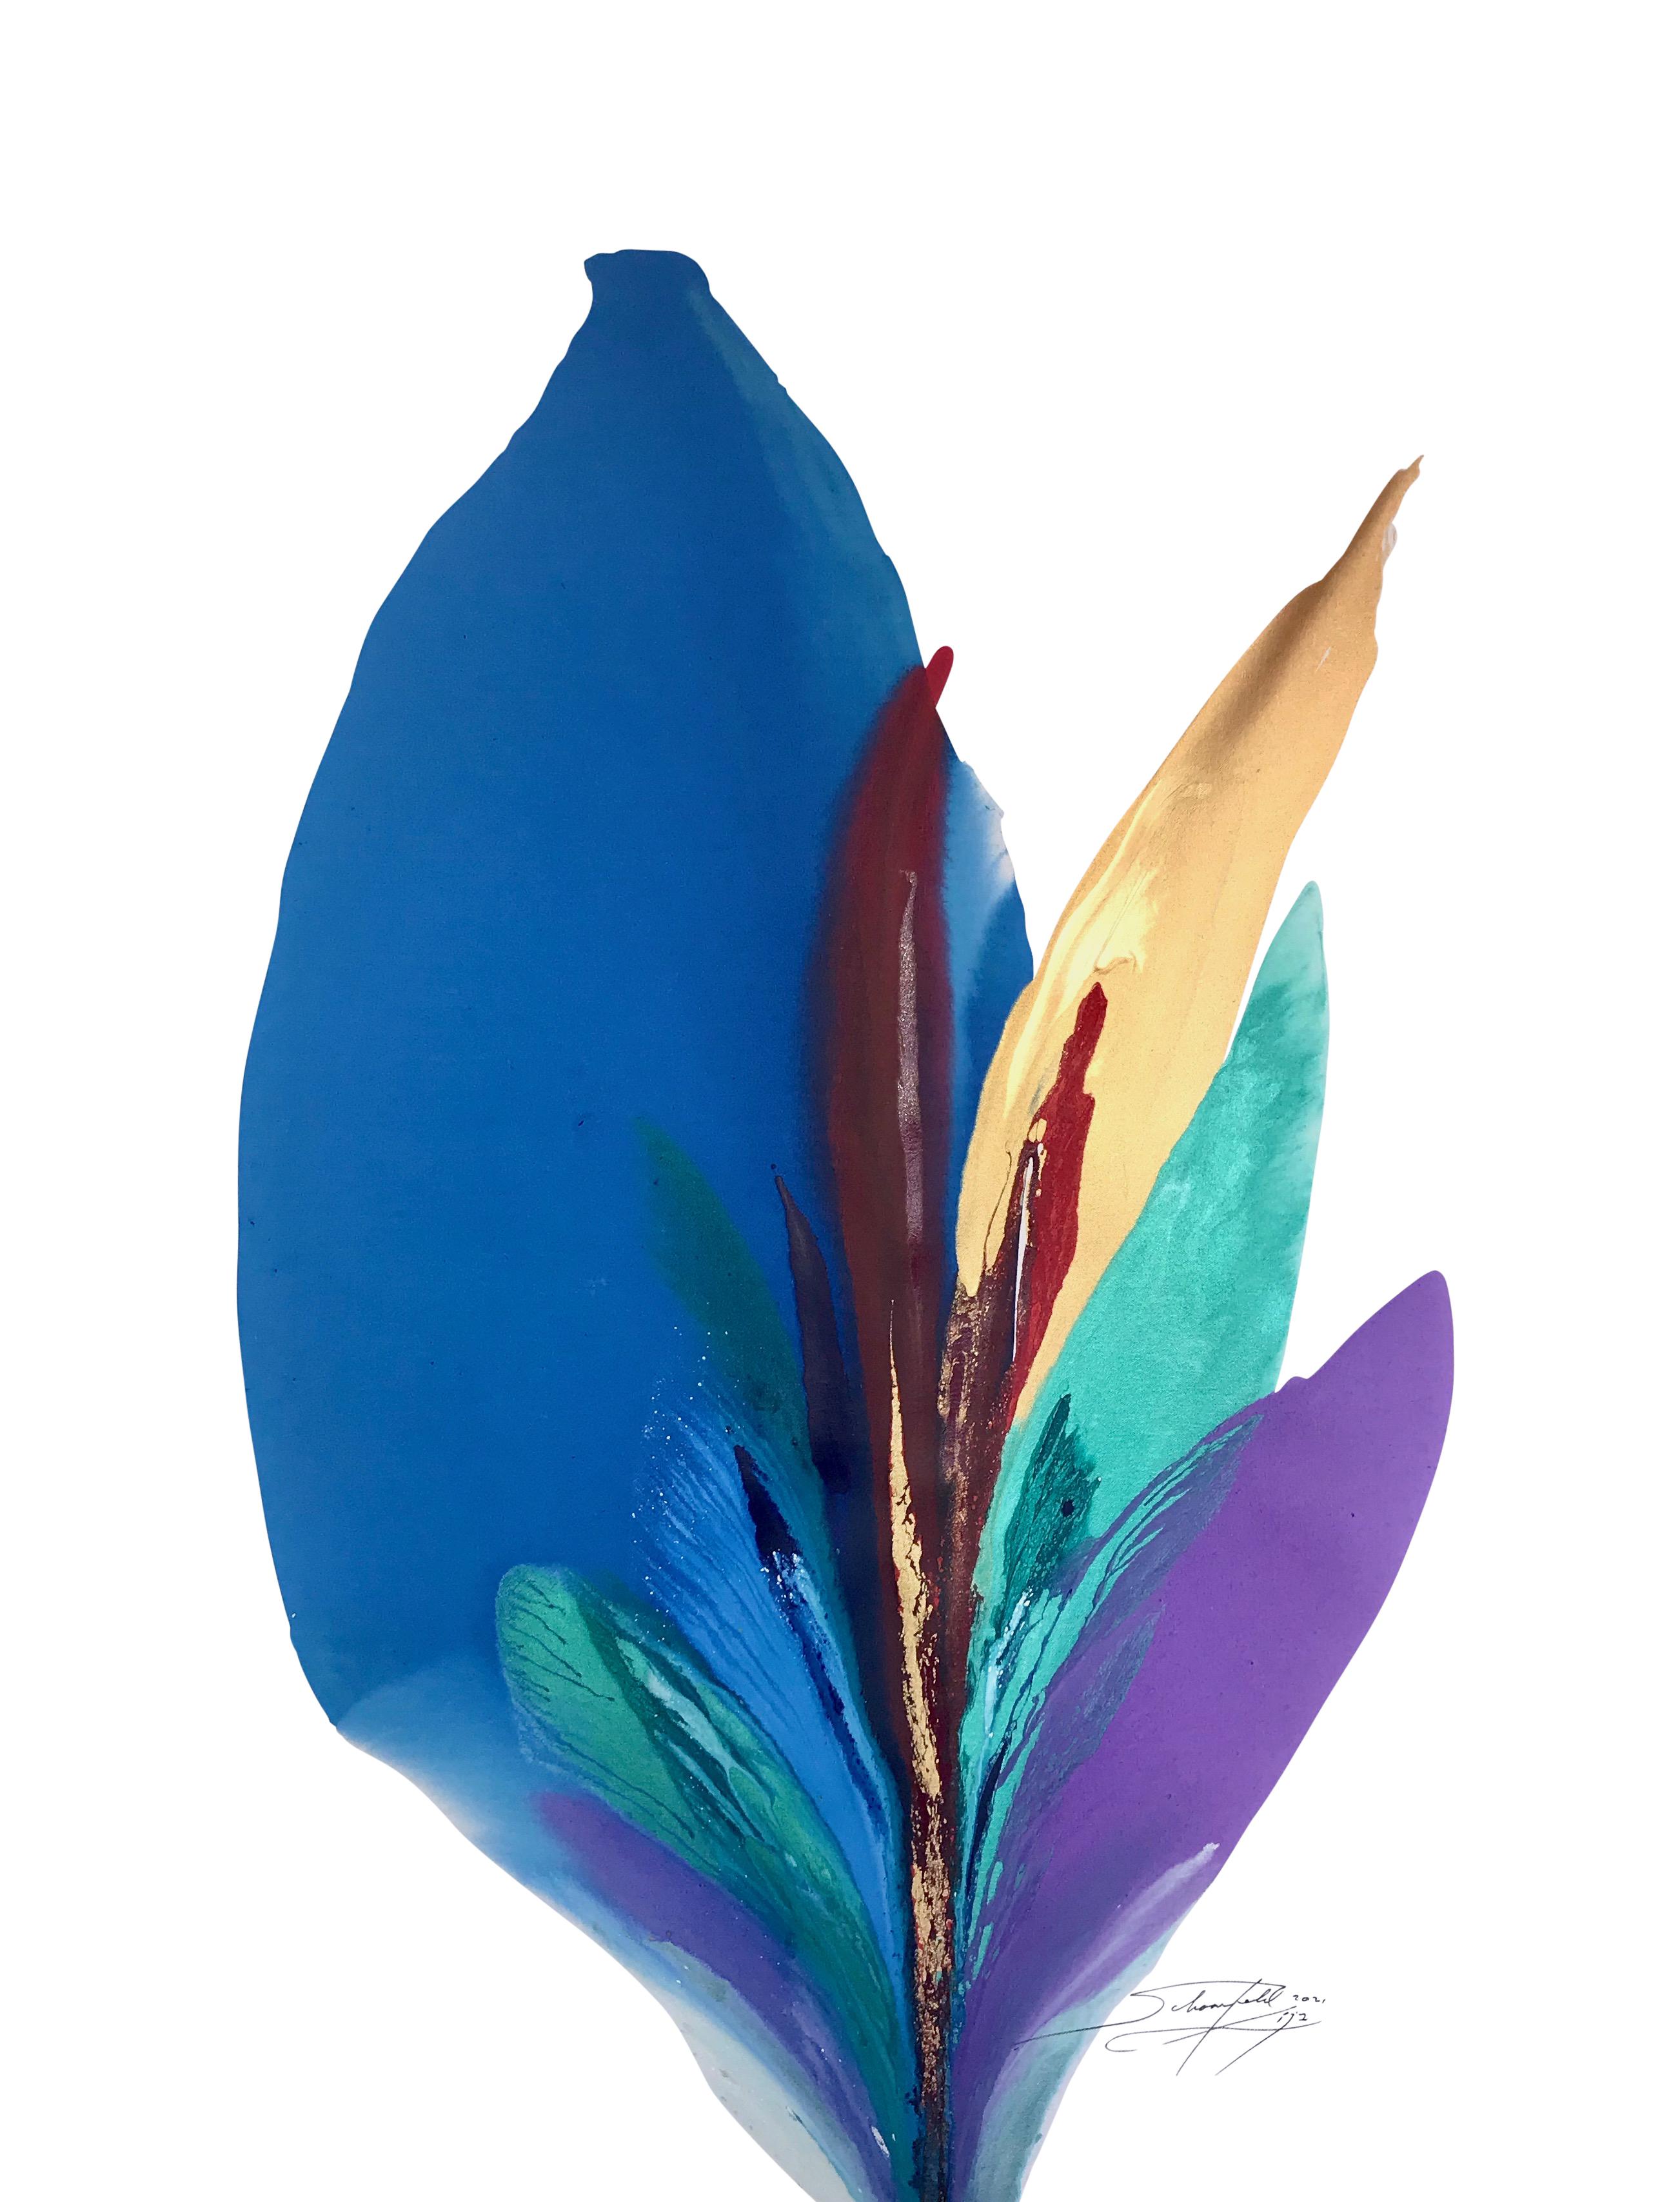 Schoenfeld, _Deep Blue Rio De Colores #2